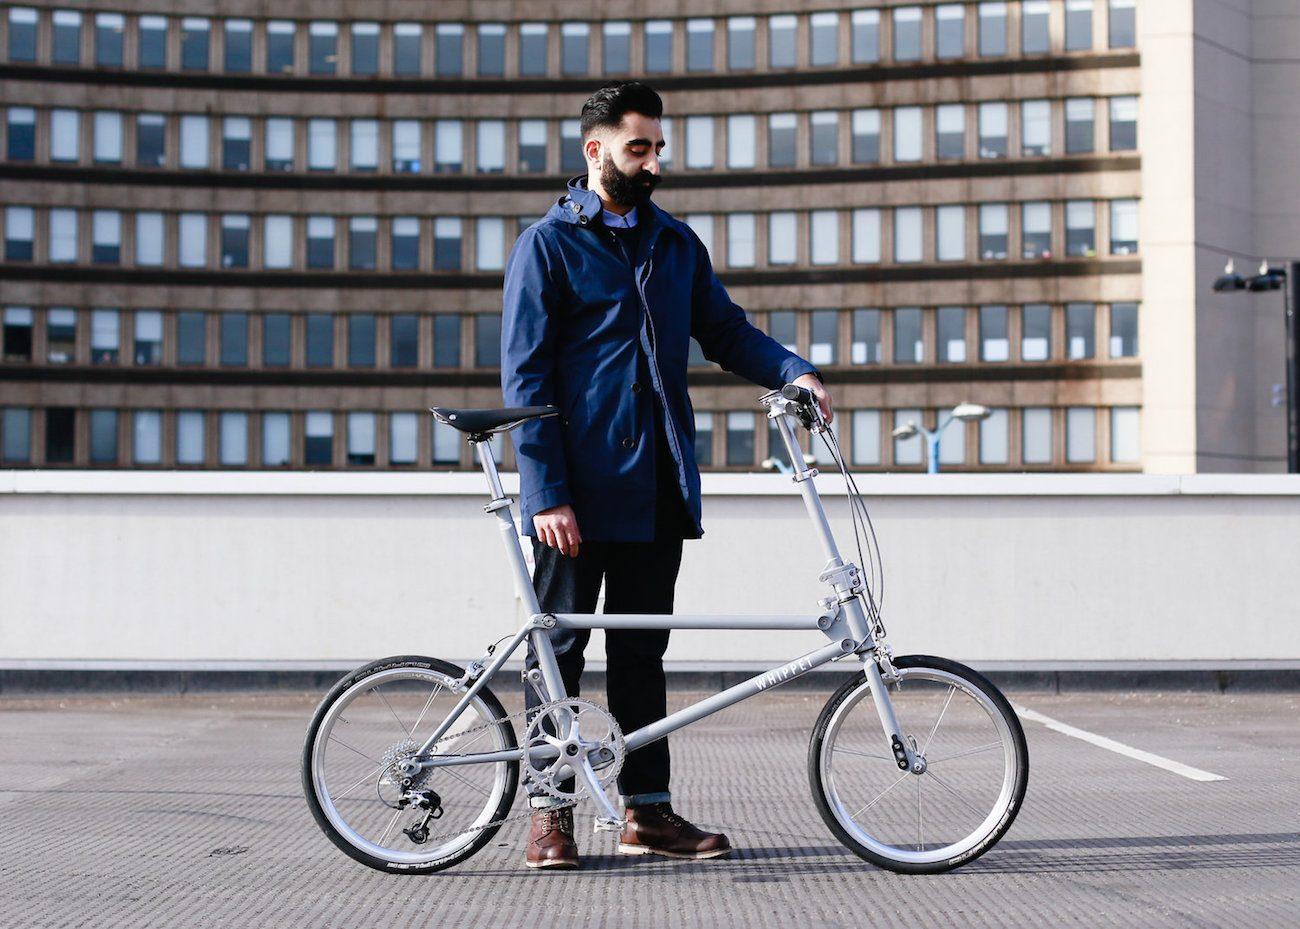 Whippet+British+Folding+Bicycle